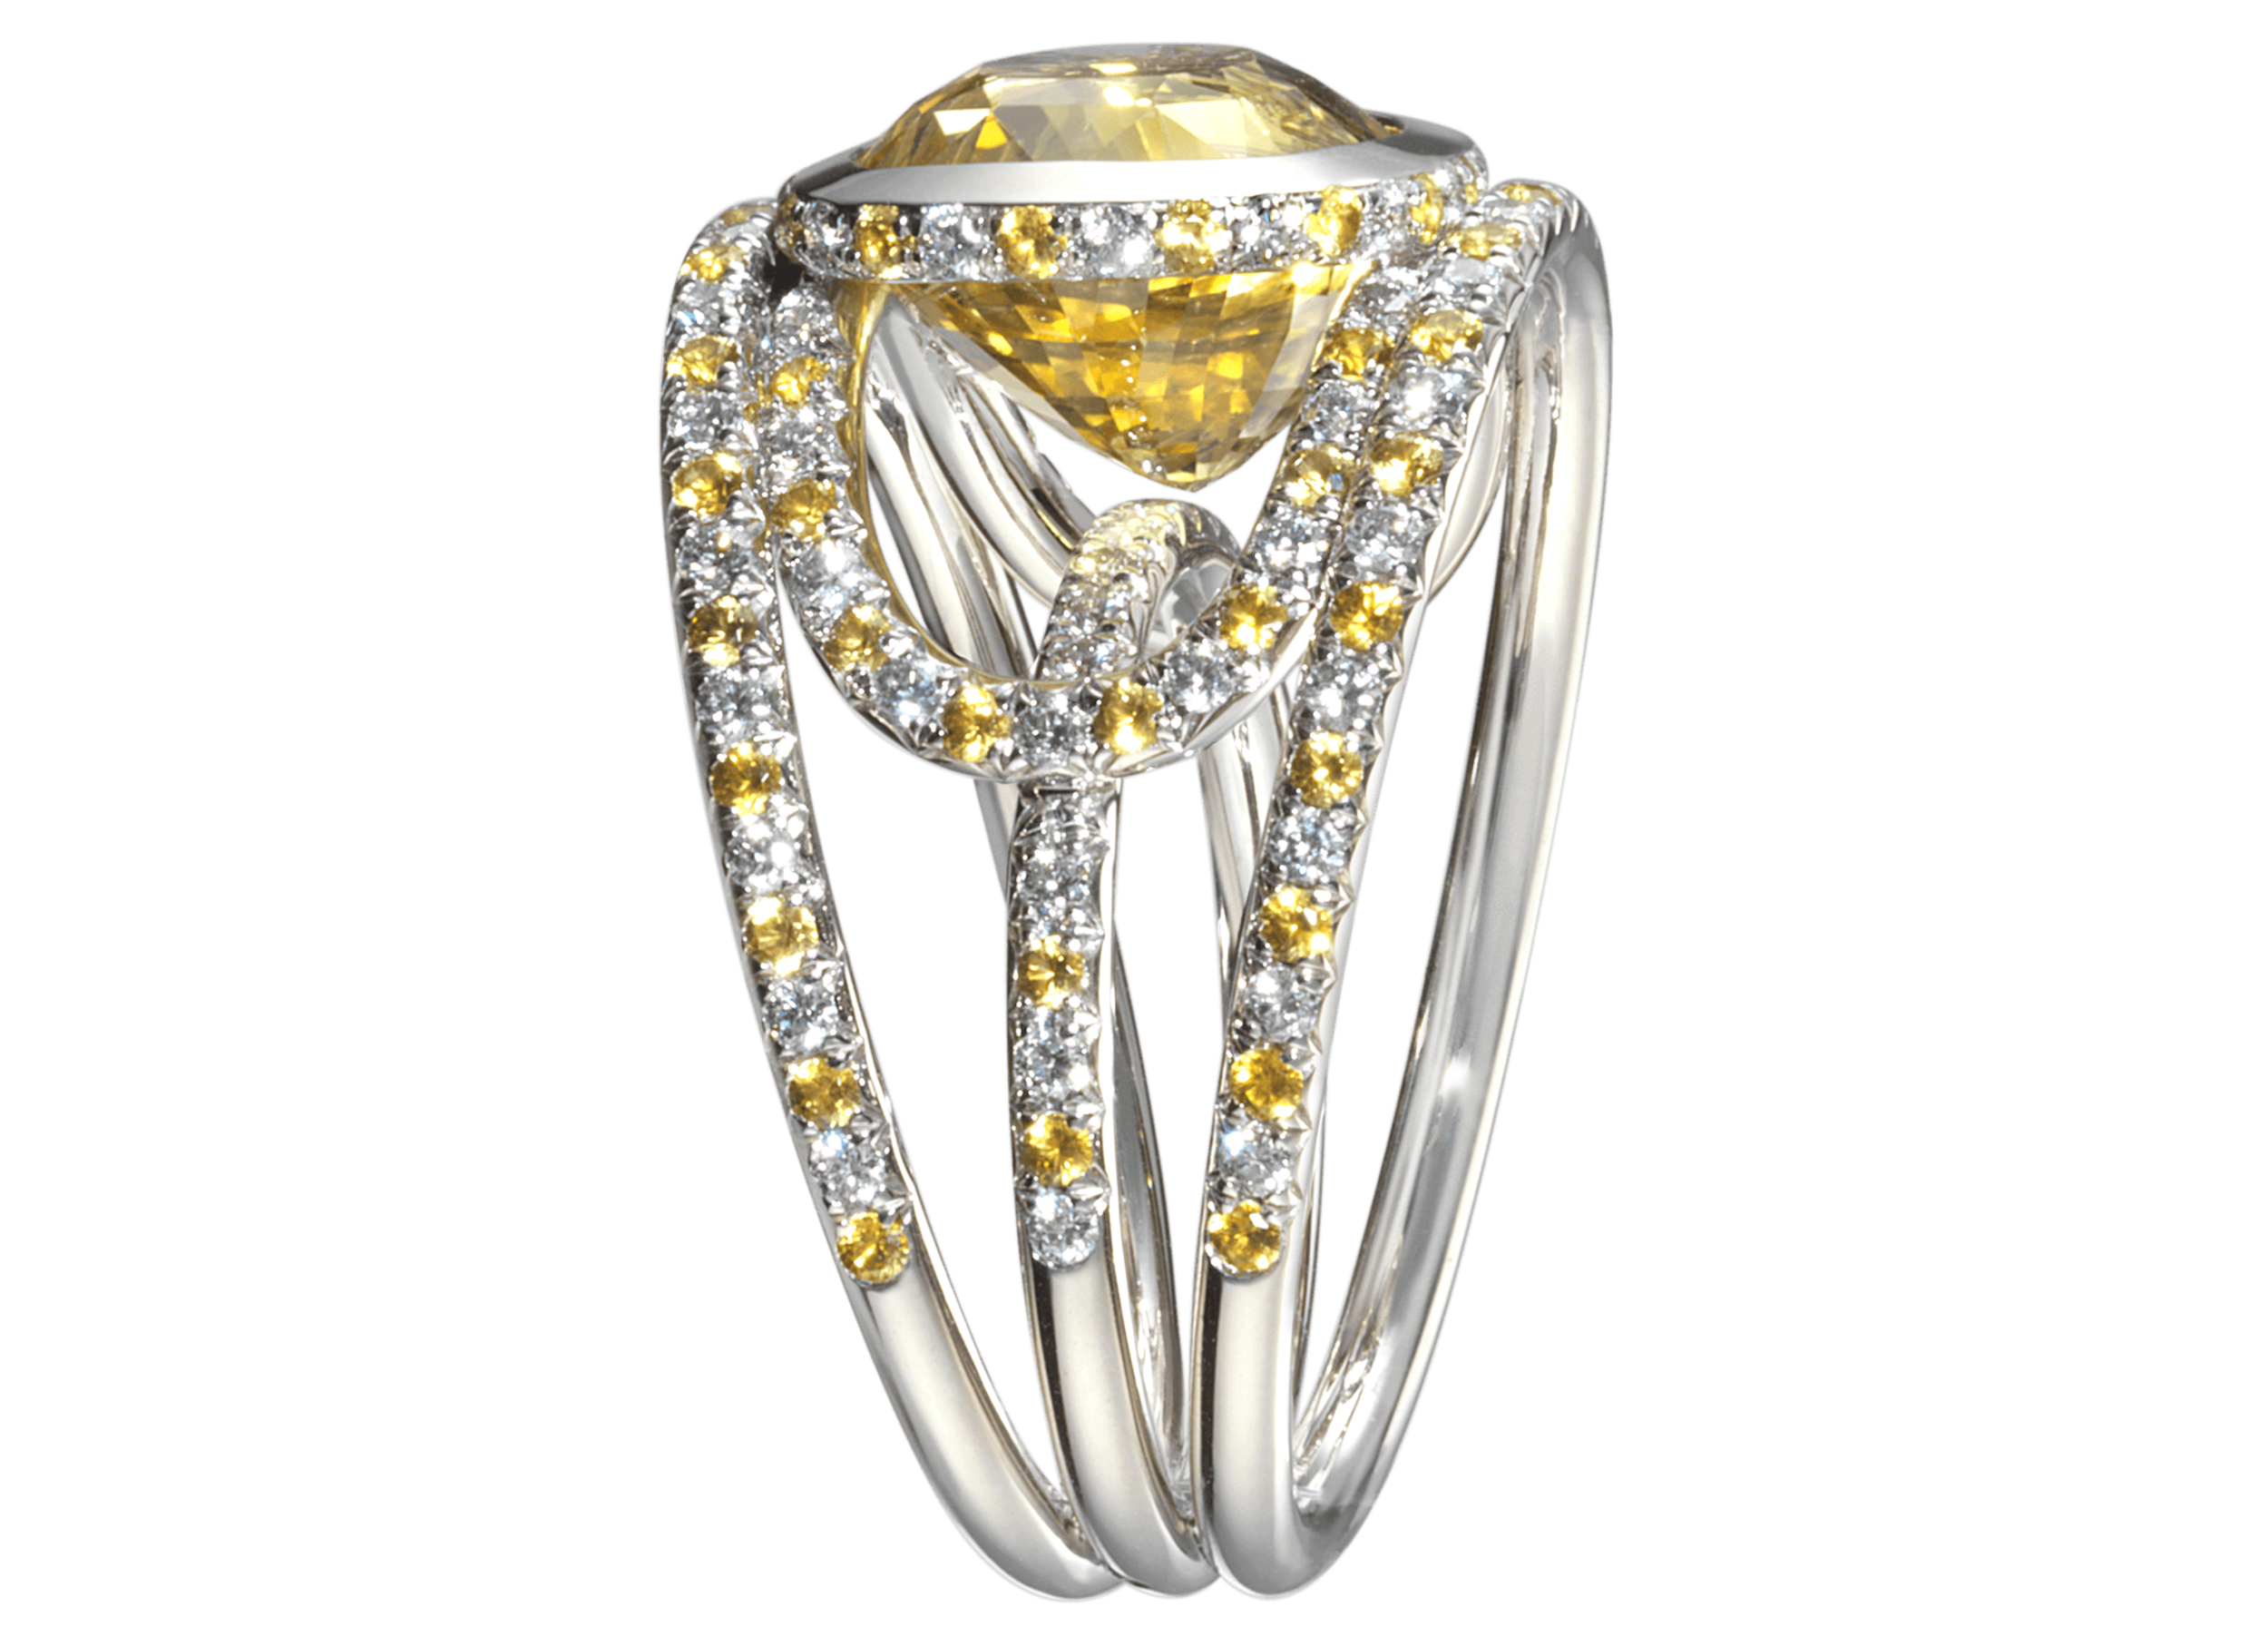 Bague Navona or blanc Saphir jaune 9,54 carats et pavage de diamants et saphirs jaunes.png